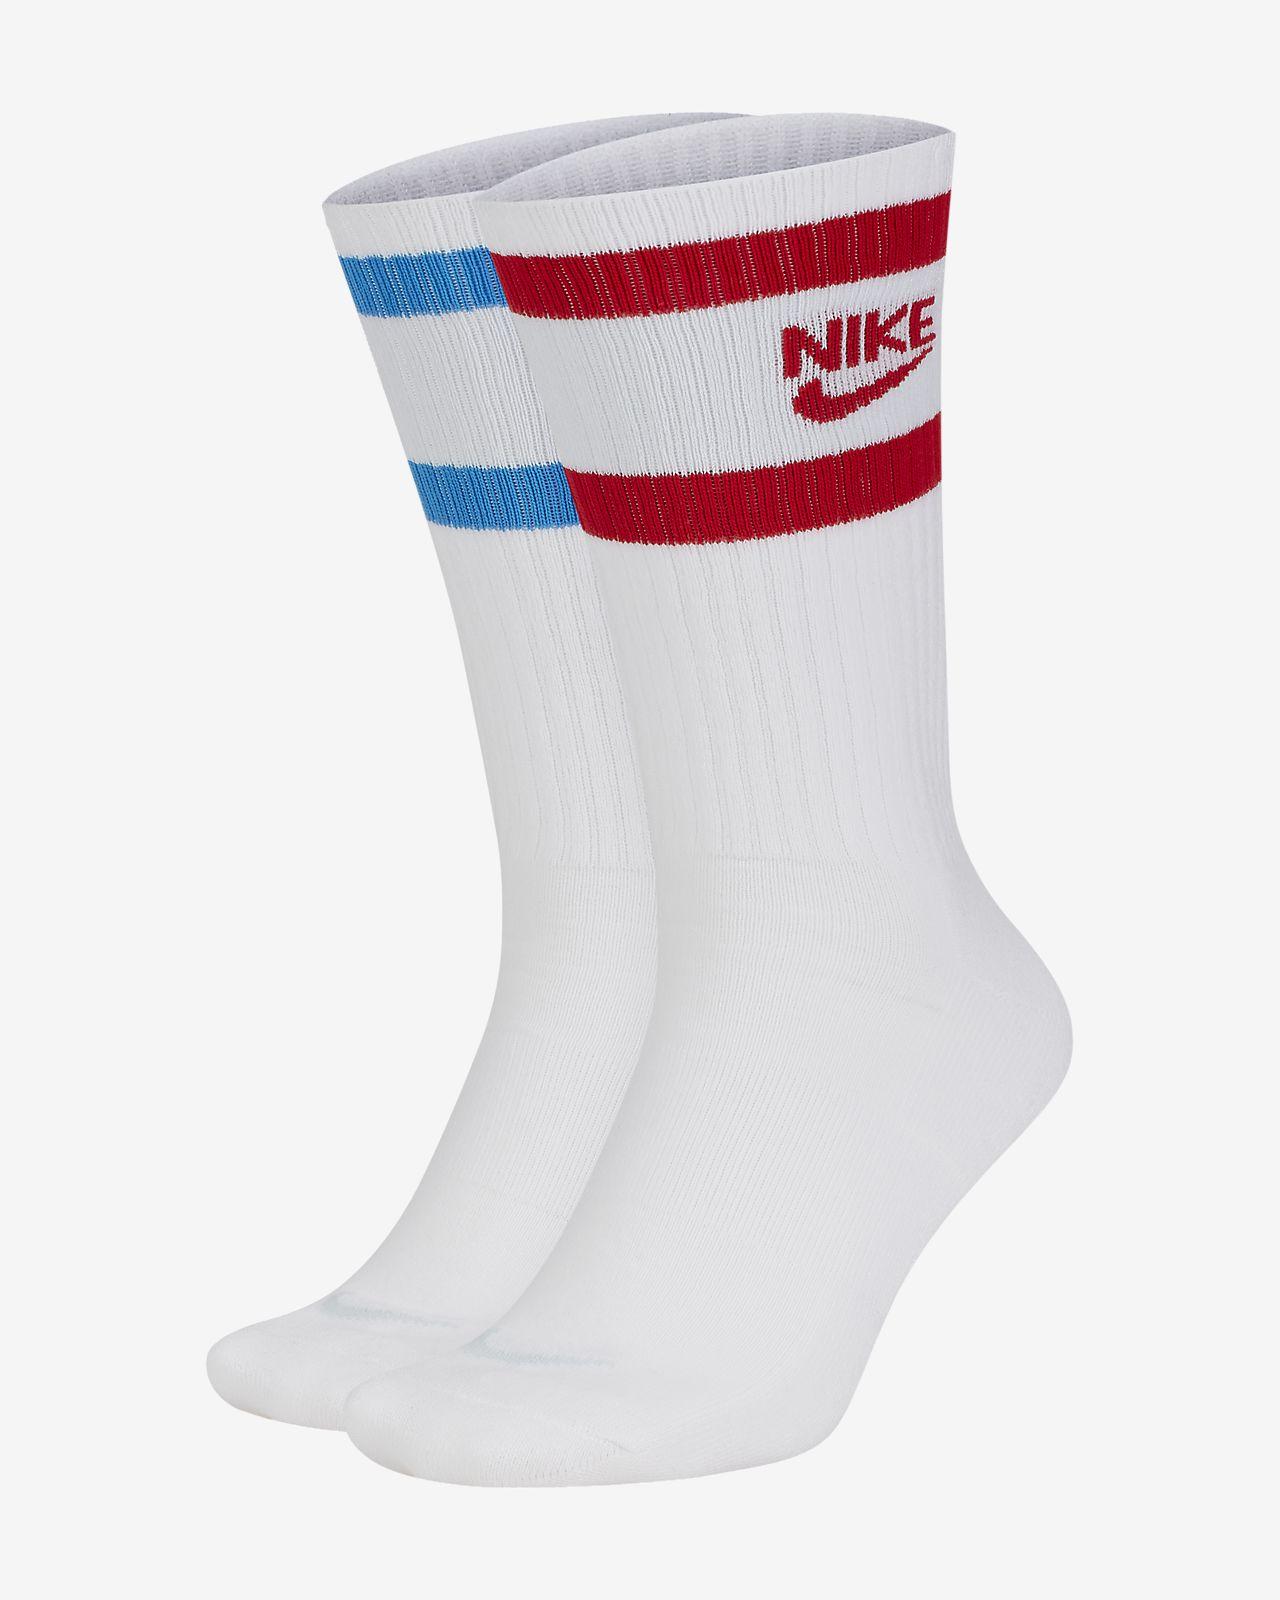 Nike Heritage Crew Socks (2 Pairs)